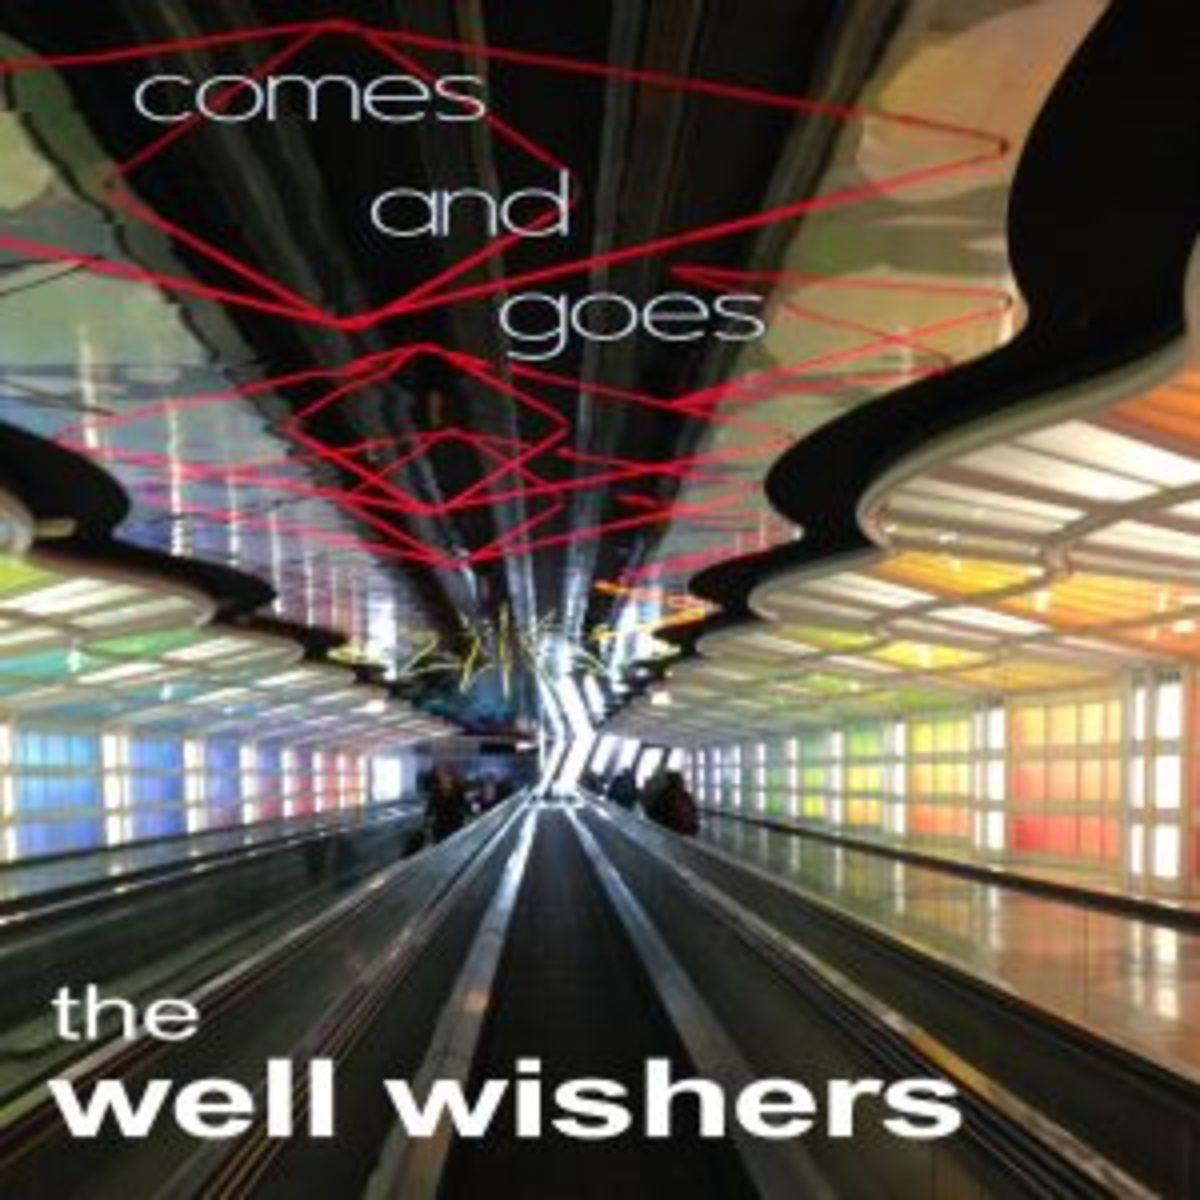 WELL WISHERS